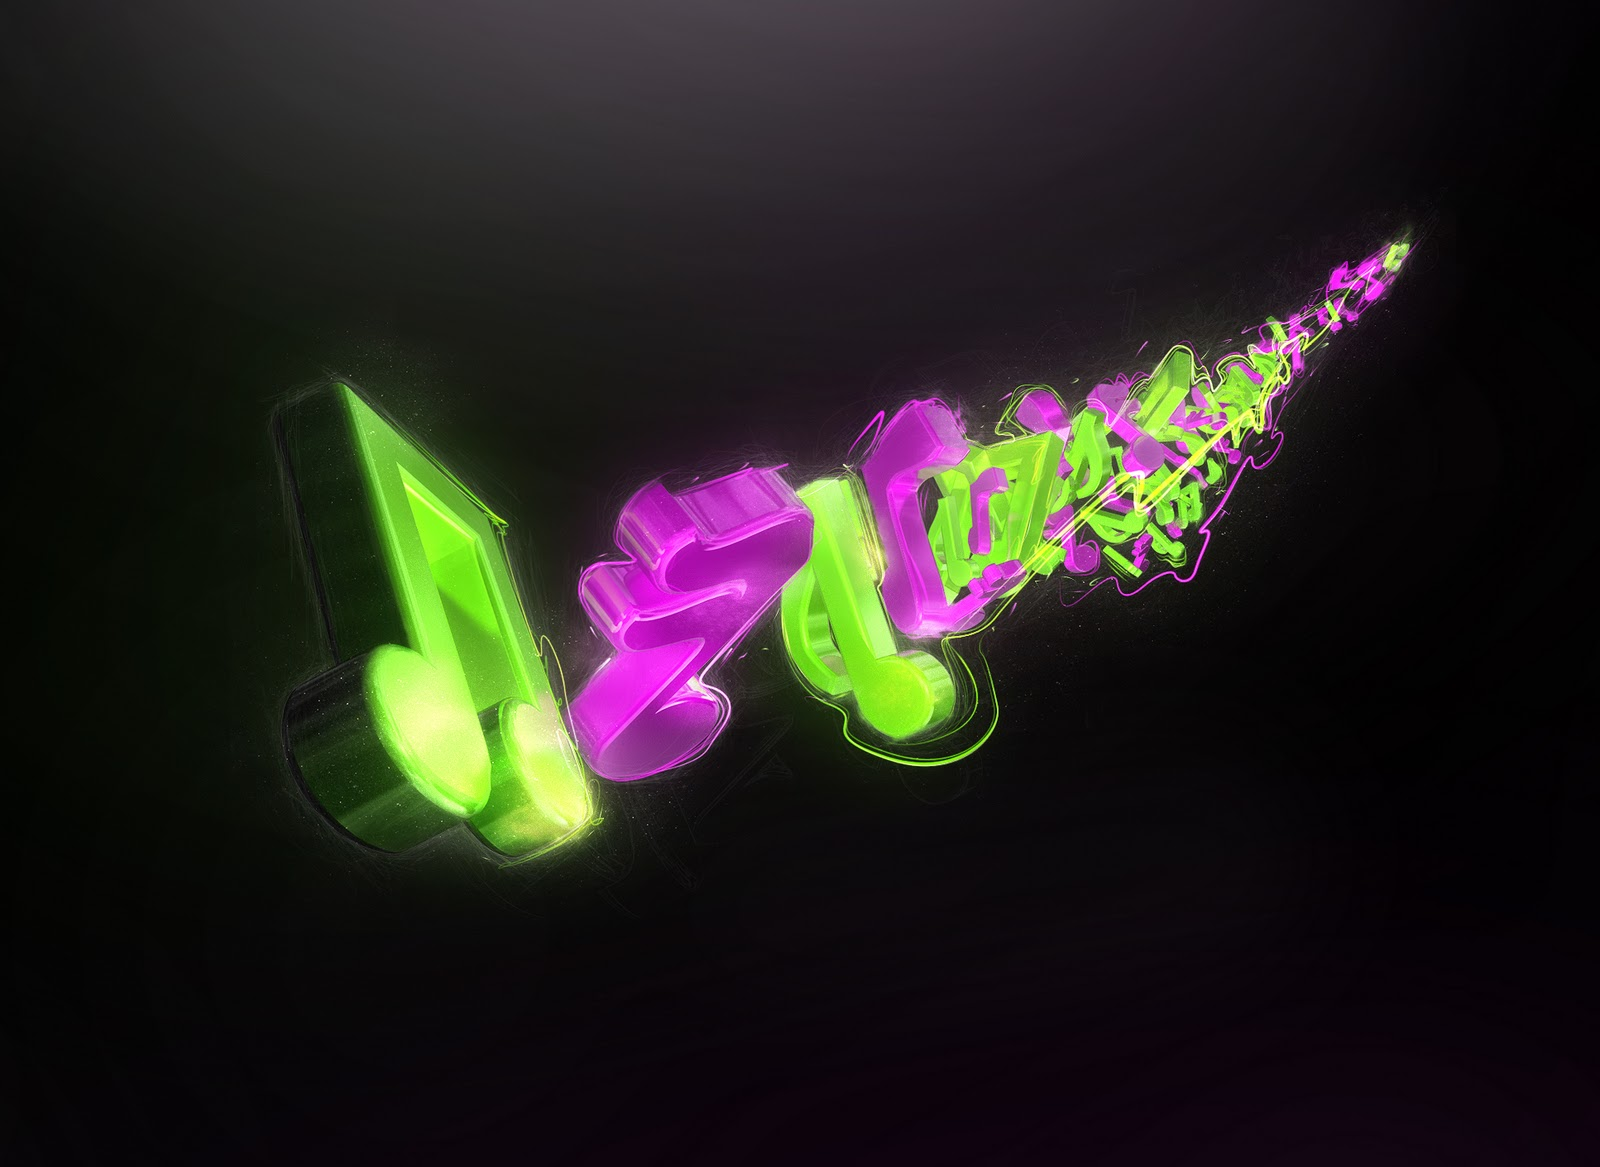 http://1.bp.blogspot.com/_36PoS3U7kvY/TTRsMjzfCgI/AAAAAAAAALY/Ol6M1ZwS0F0/s1600/gracias+por+la+musica.jpg